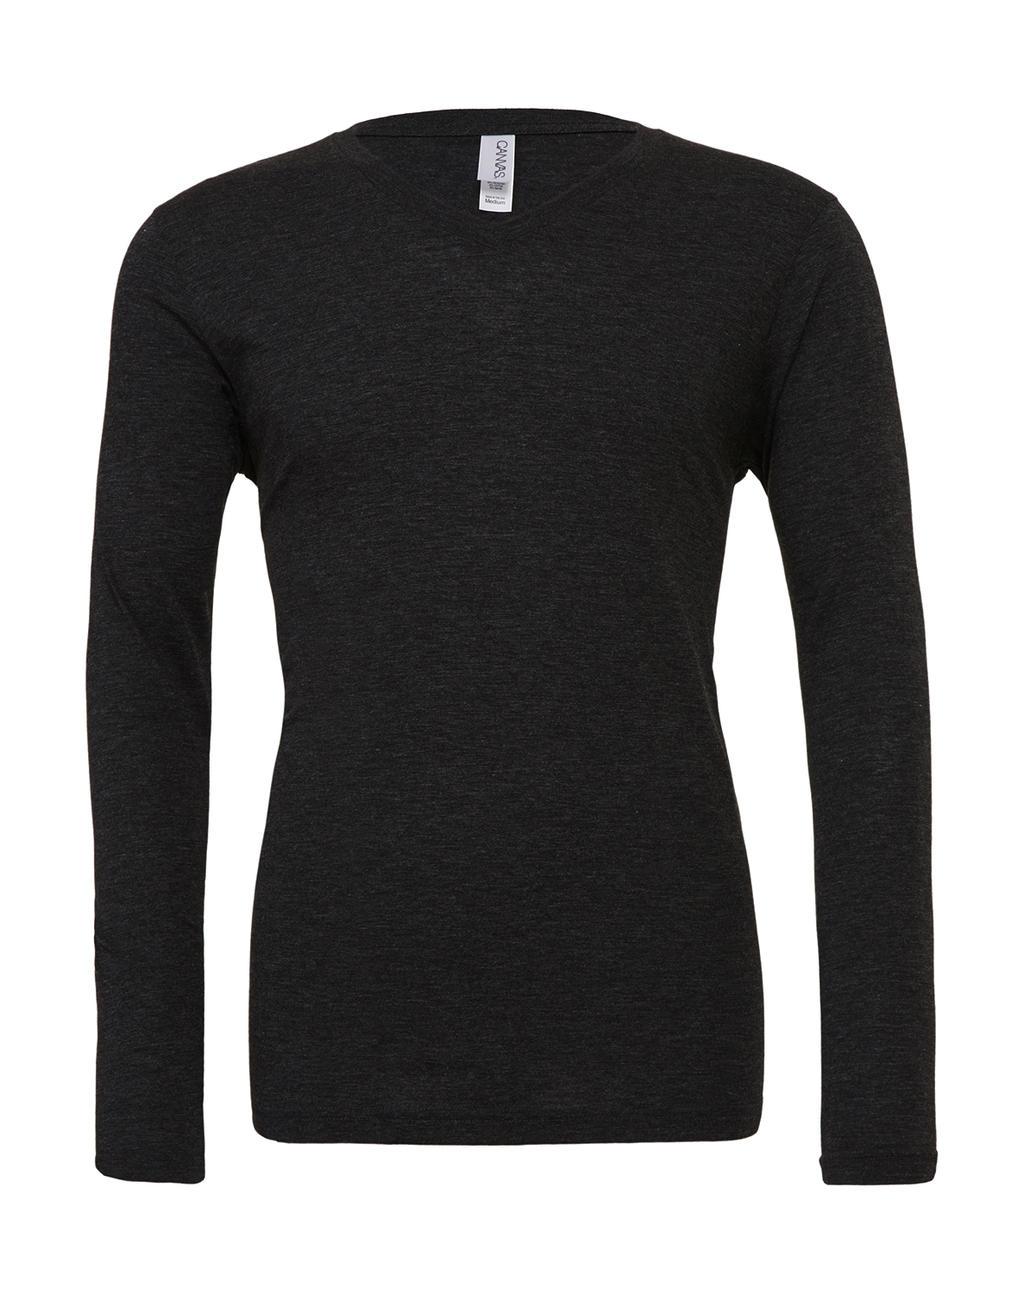 Unisex LS V-Neck T-Shirt